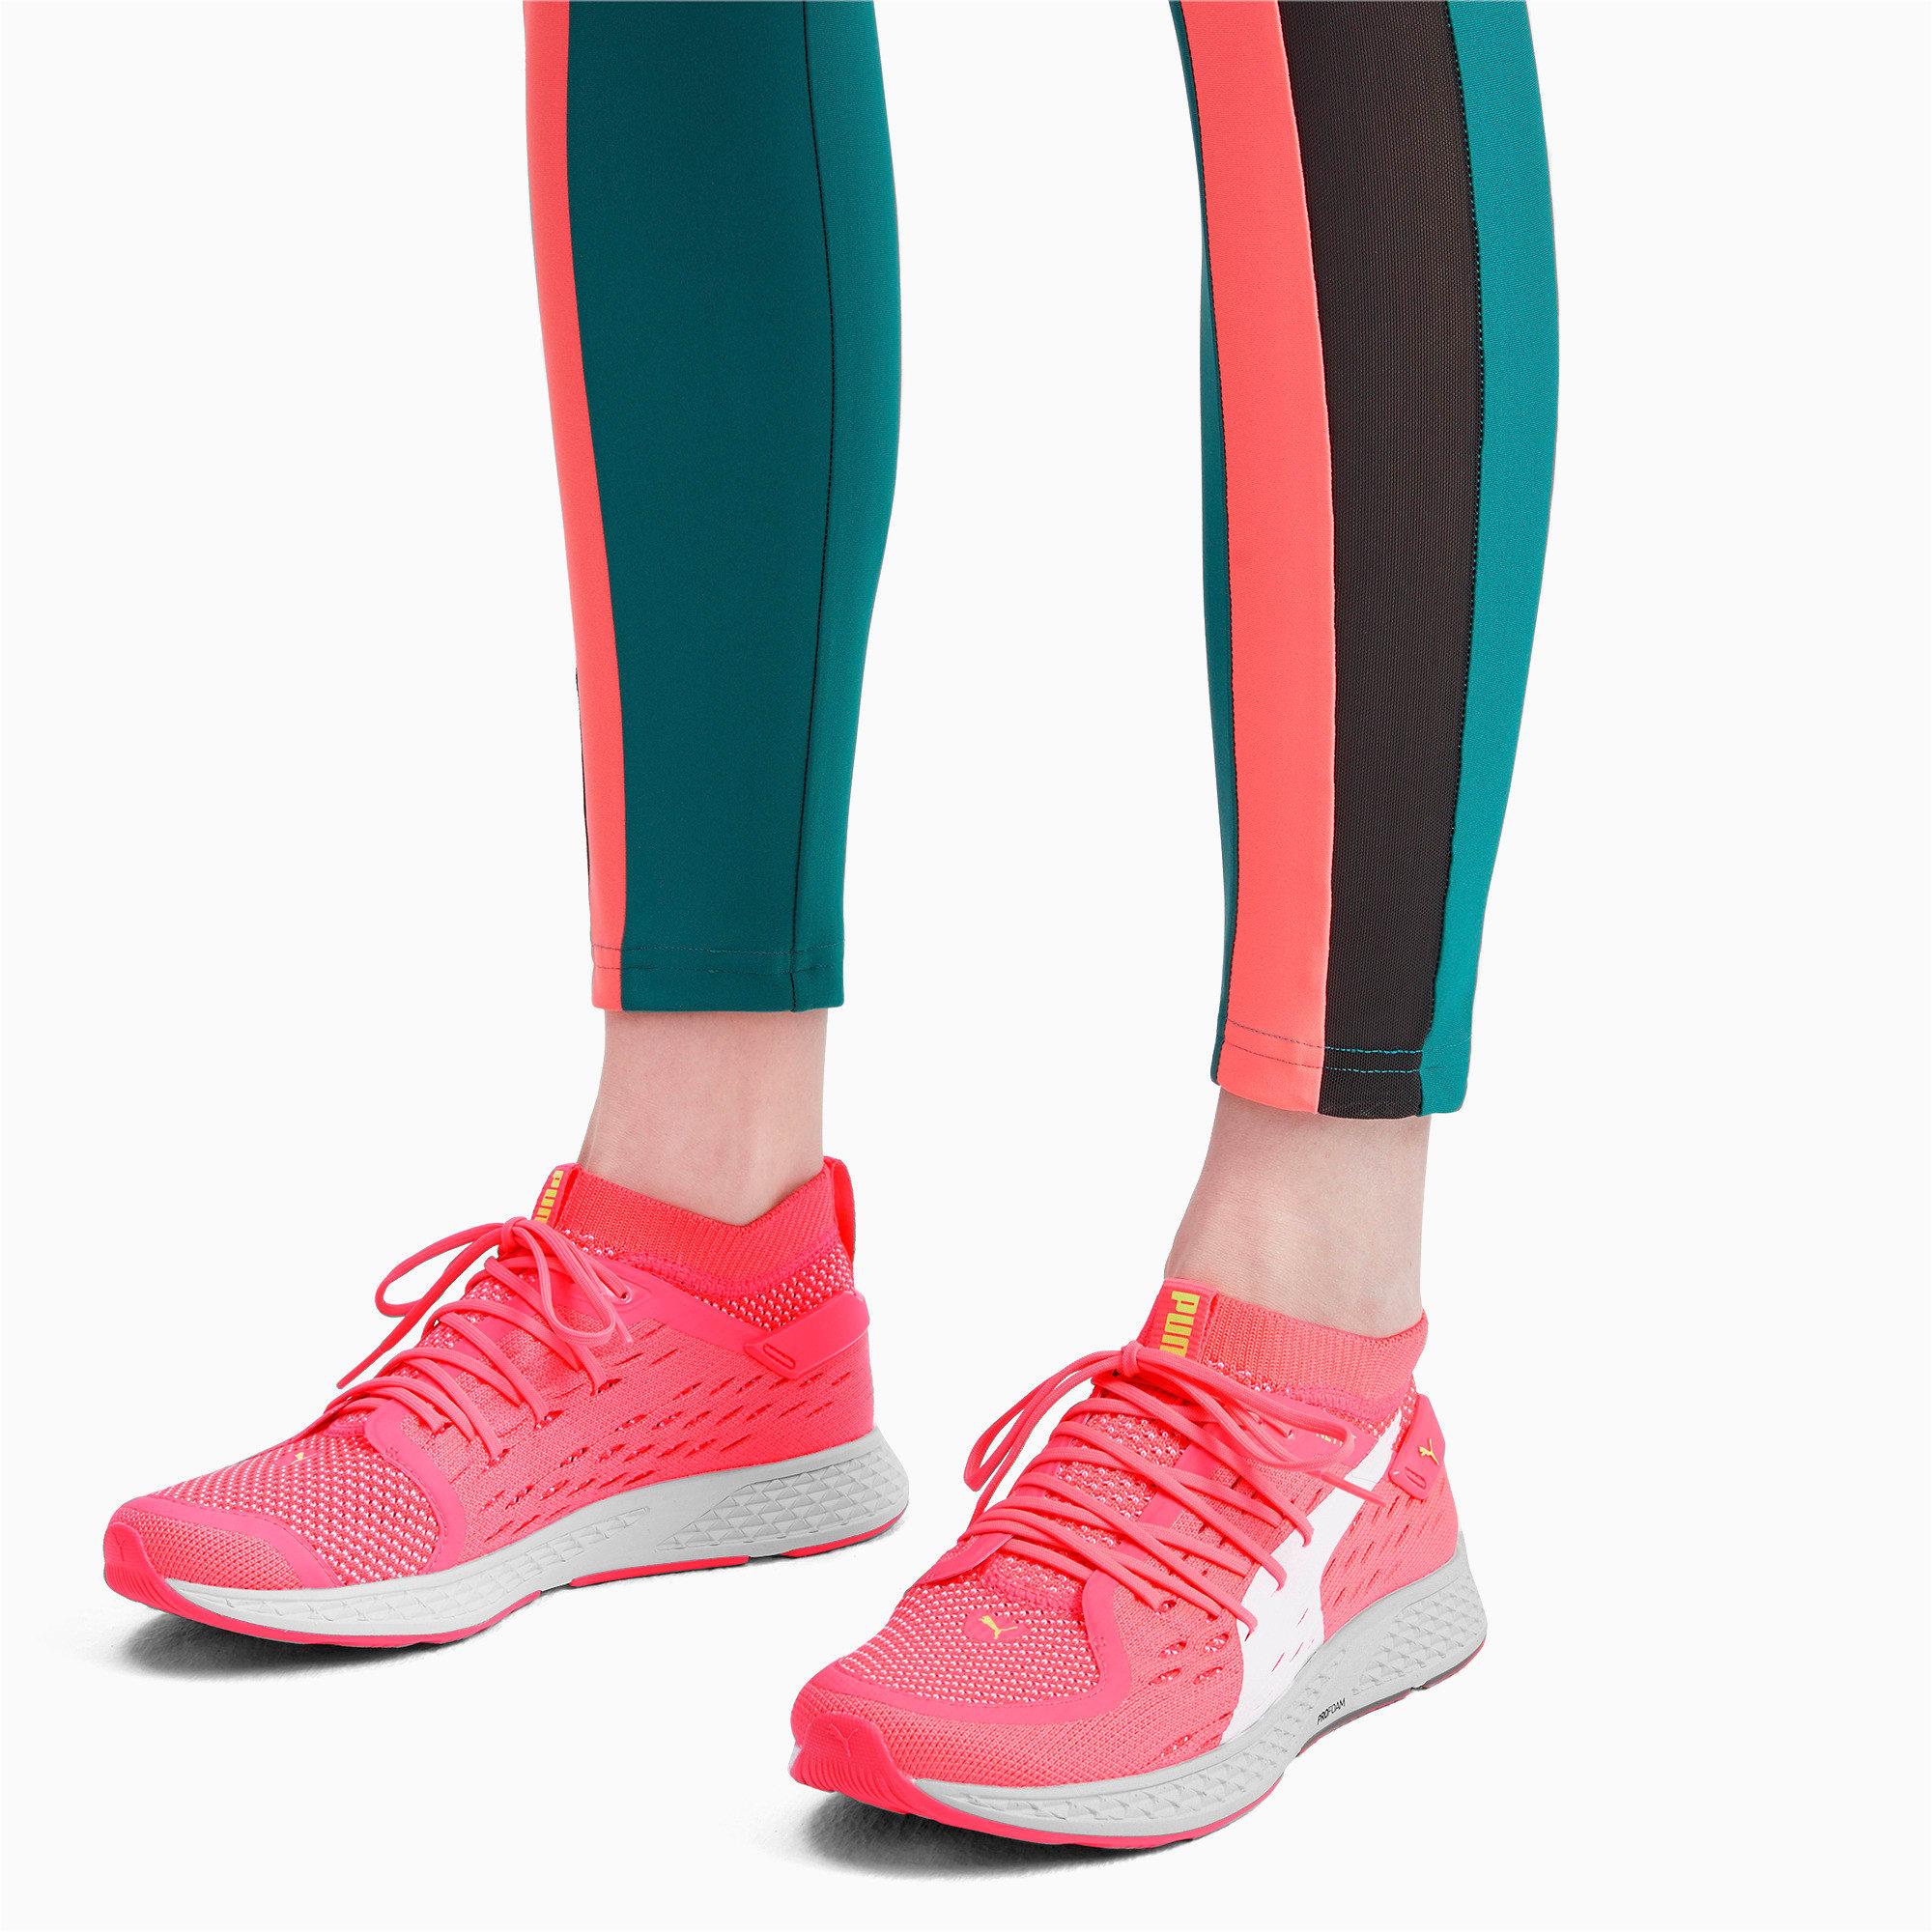 Miniatura 3 de Zapatos para correrSPEED500 para mujer, Pink Alert-White-Yellow, mediano